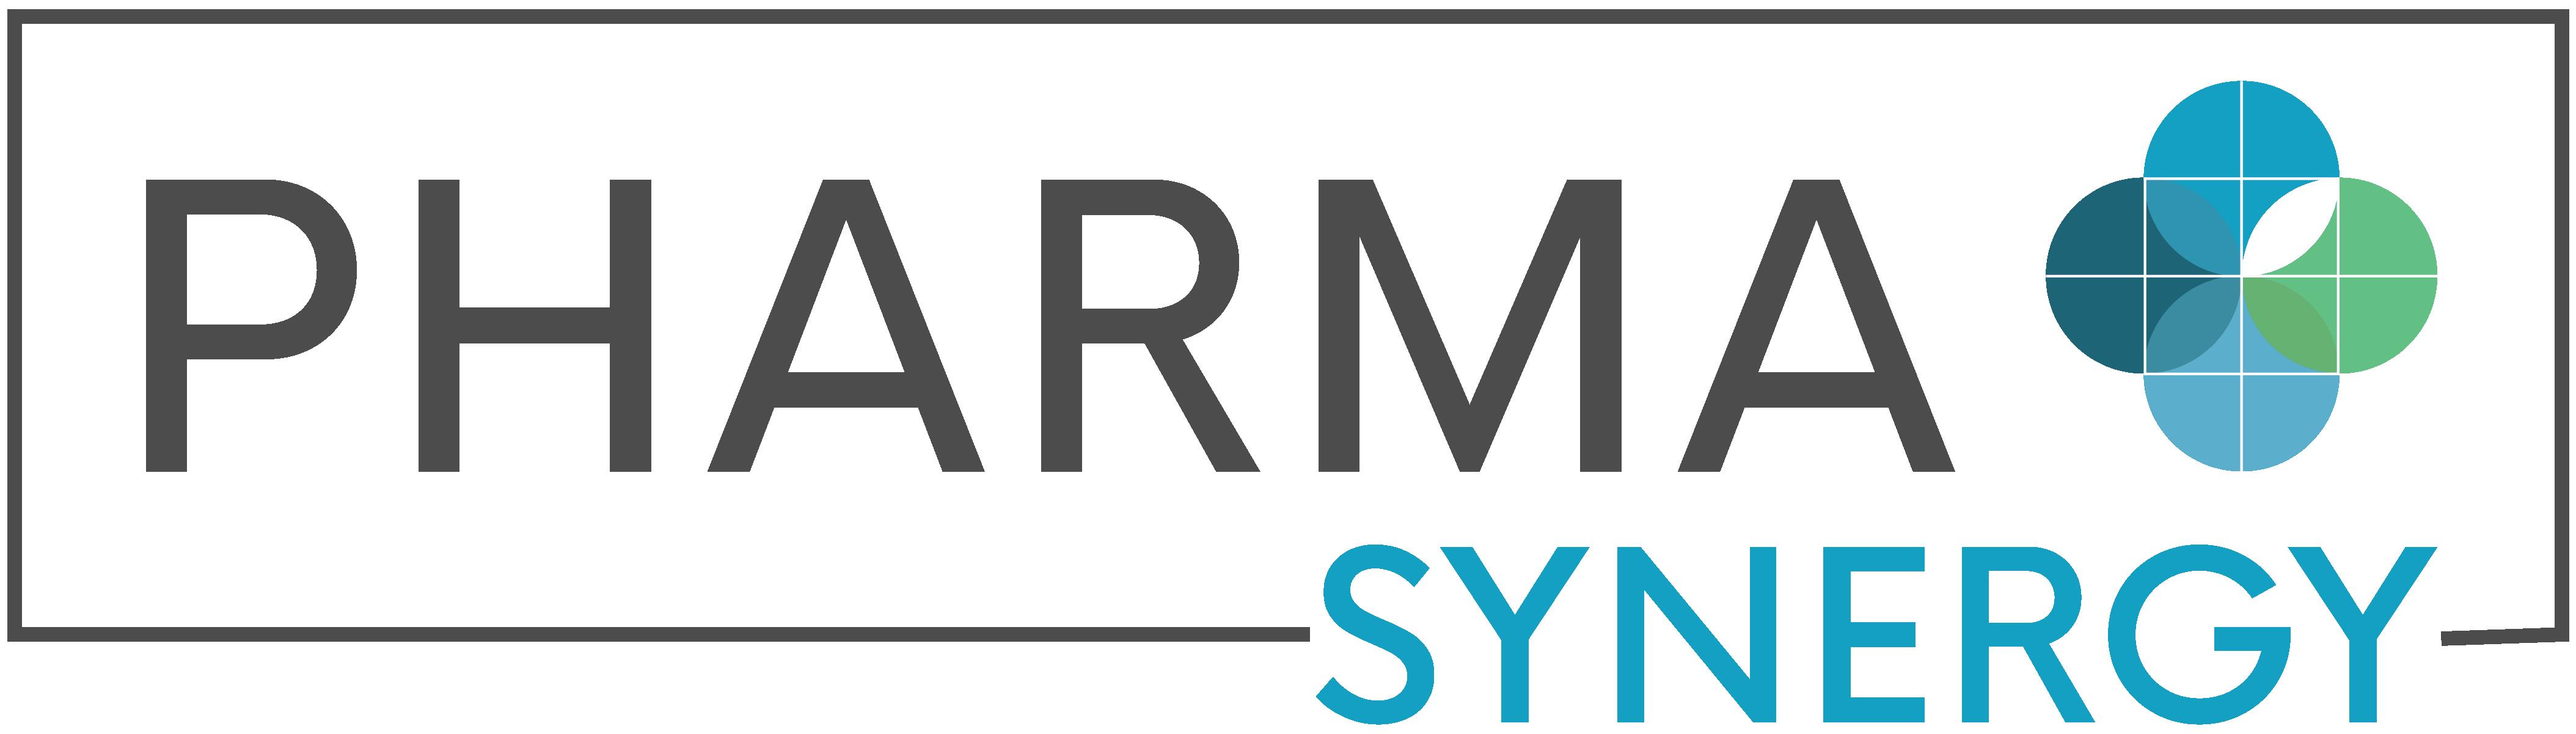 Pharma Synergy final 1-01